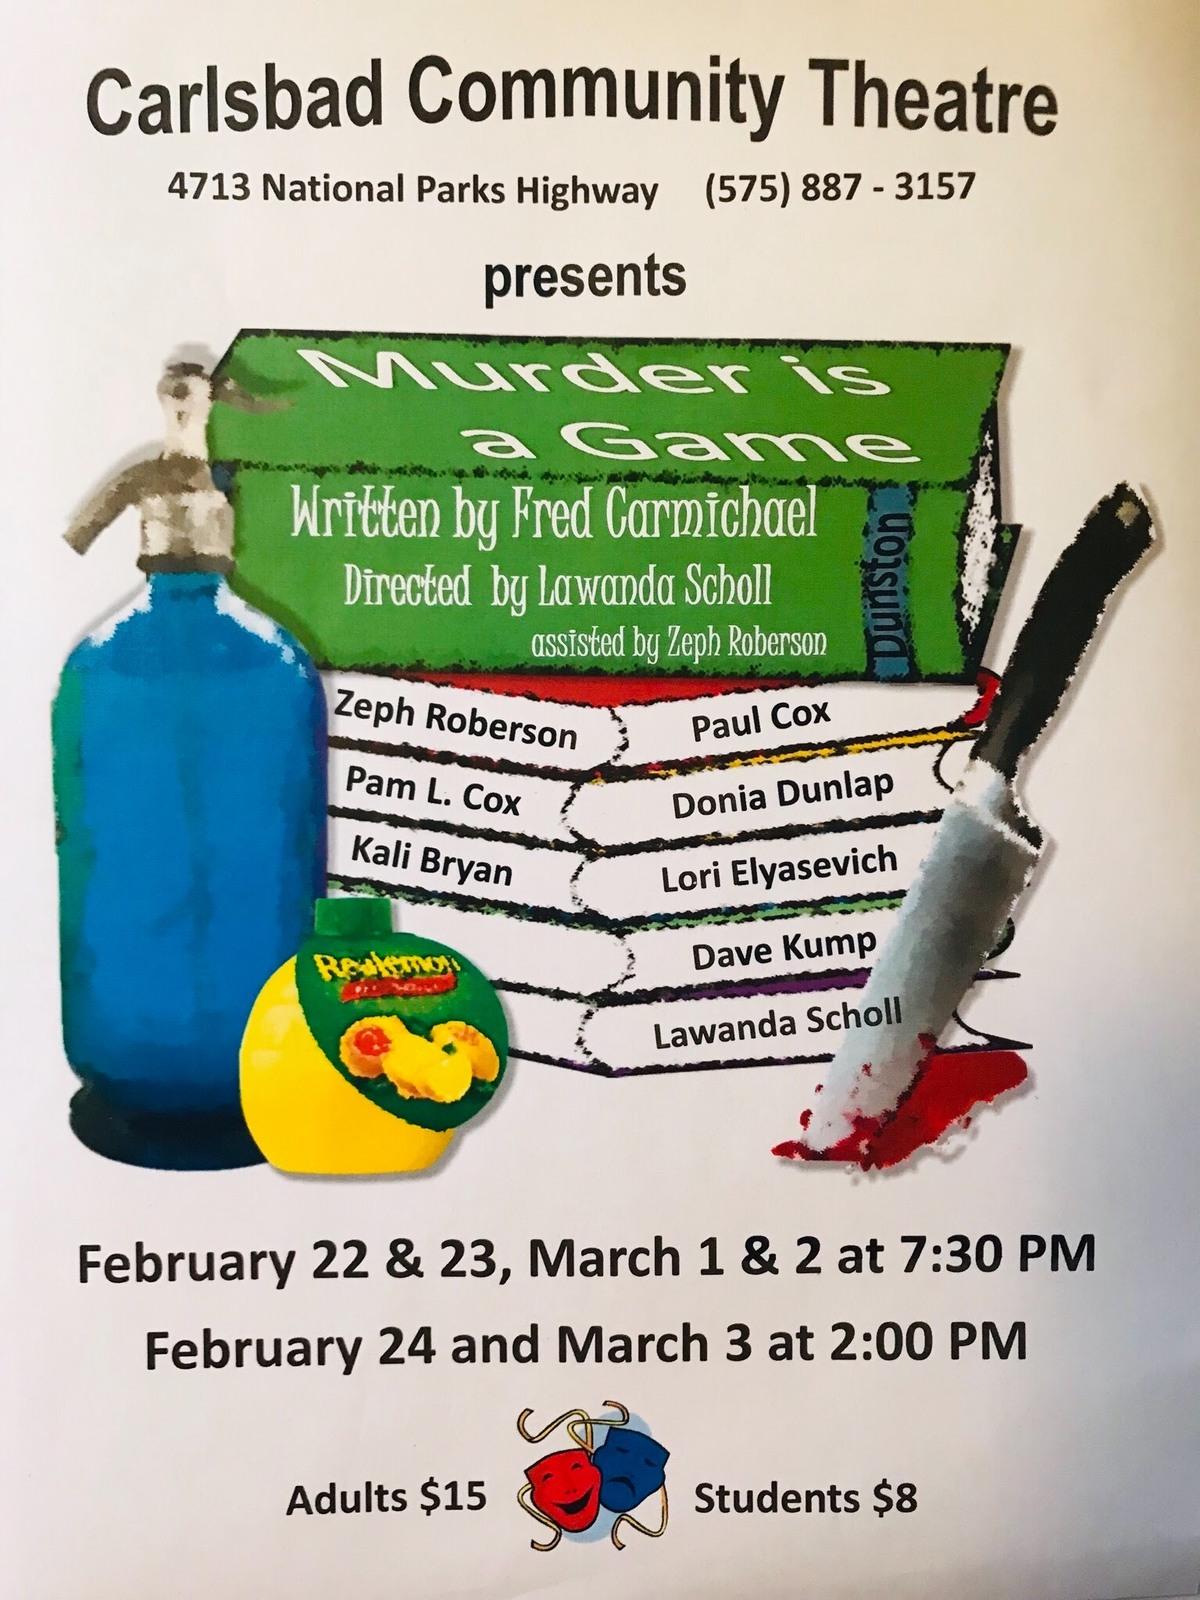 Carlsbad Community Theater!